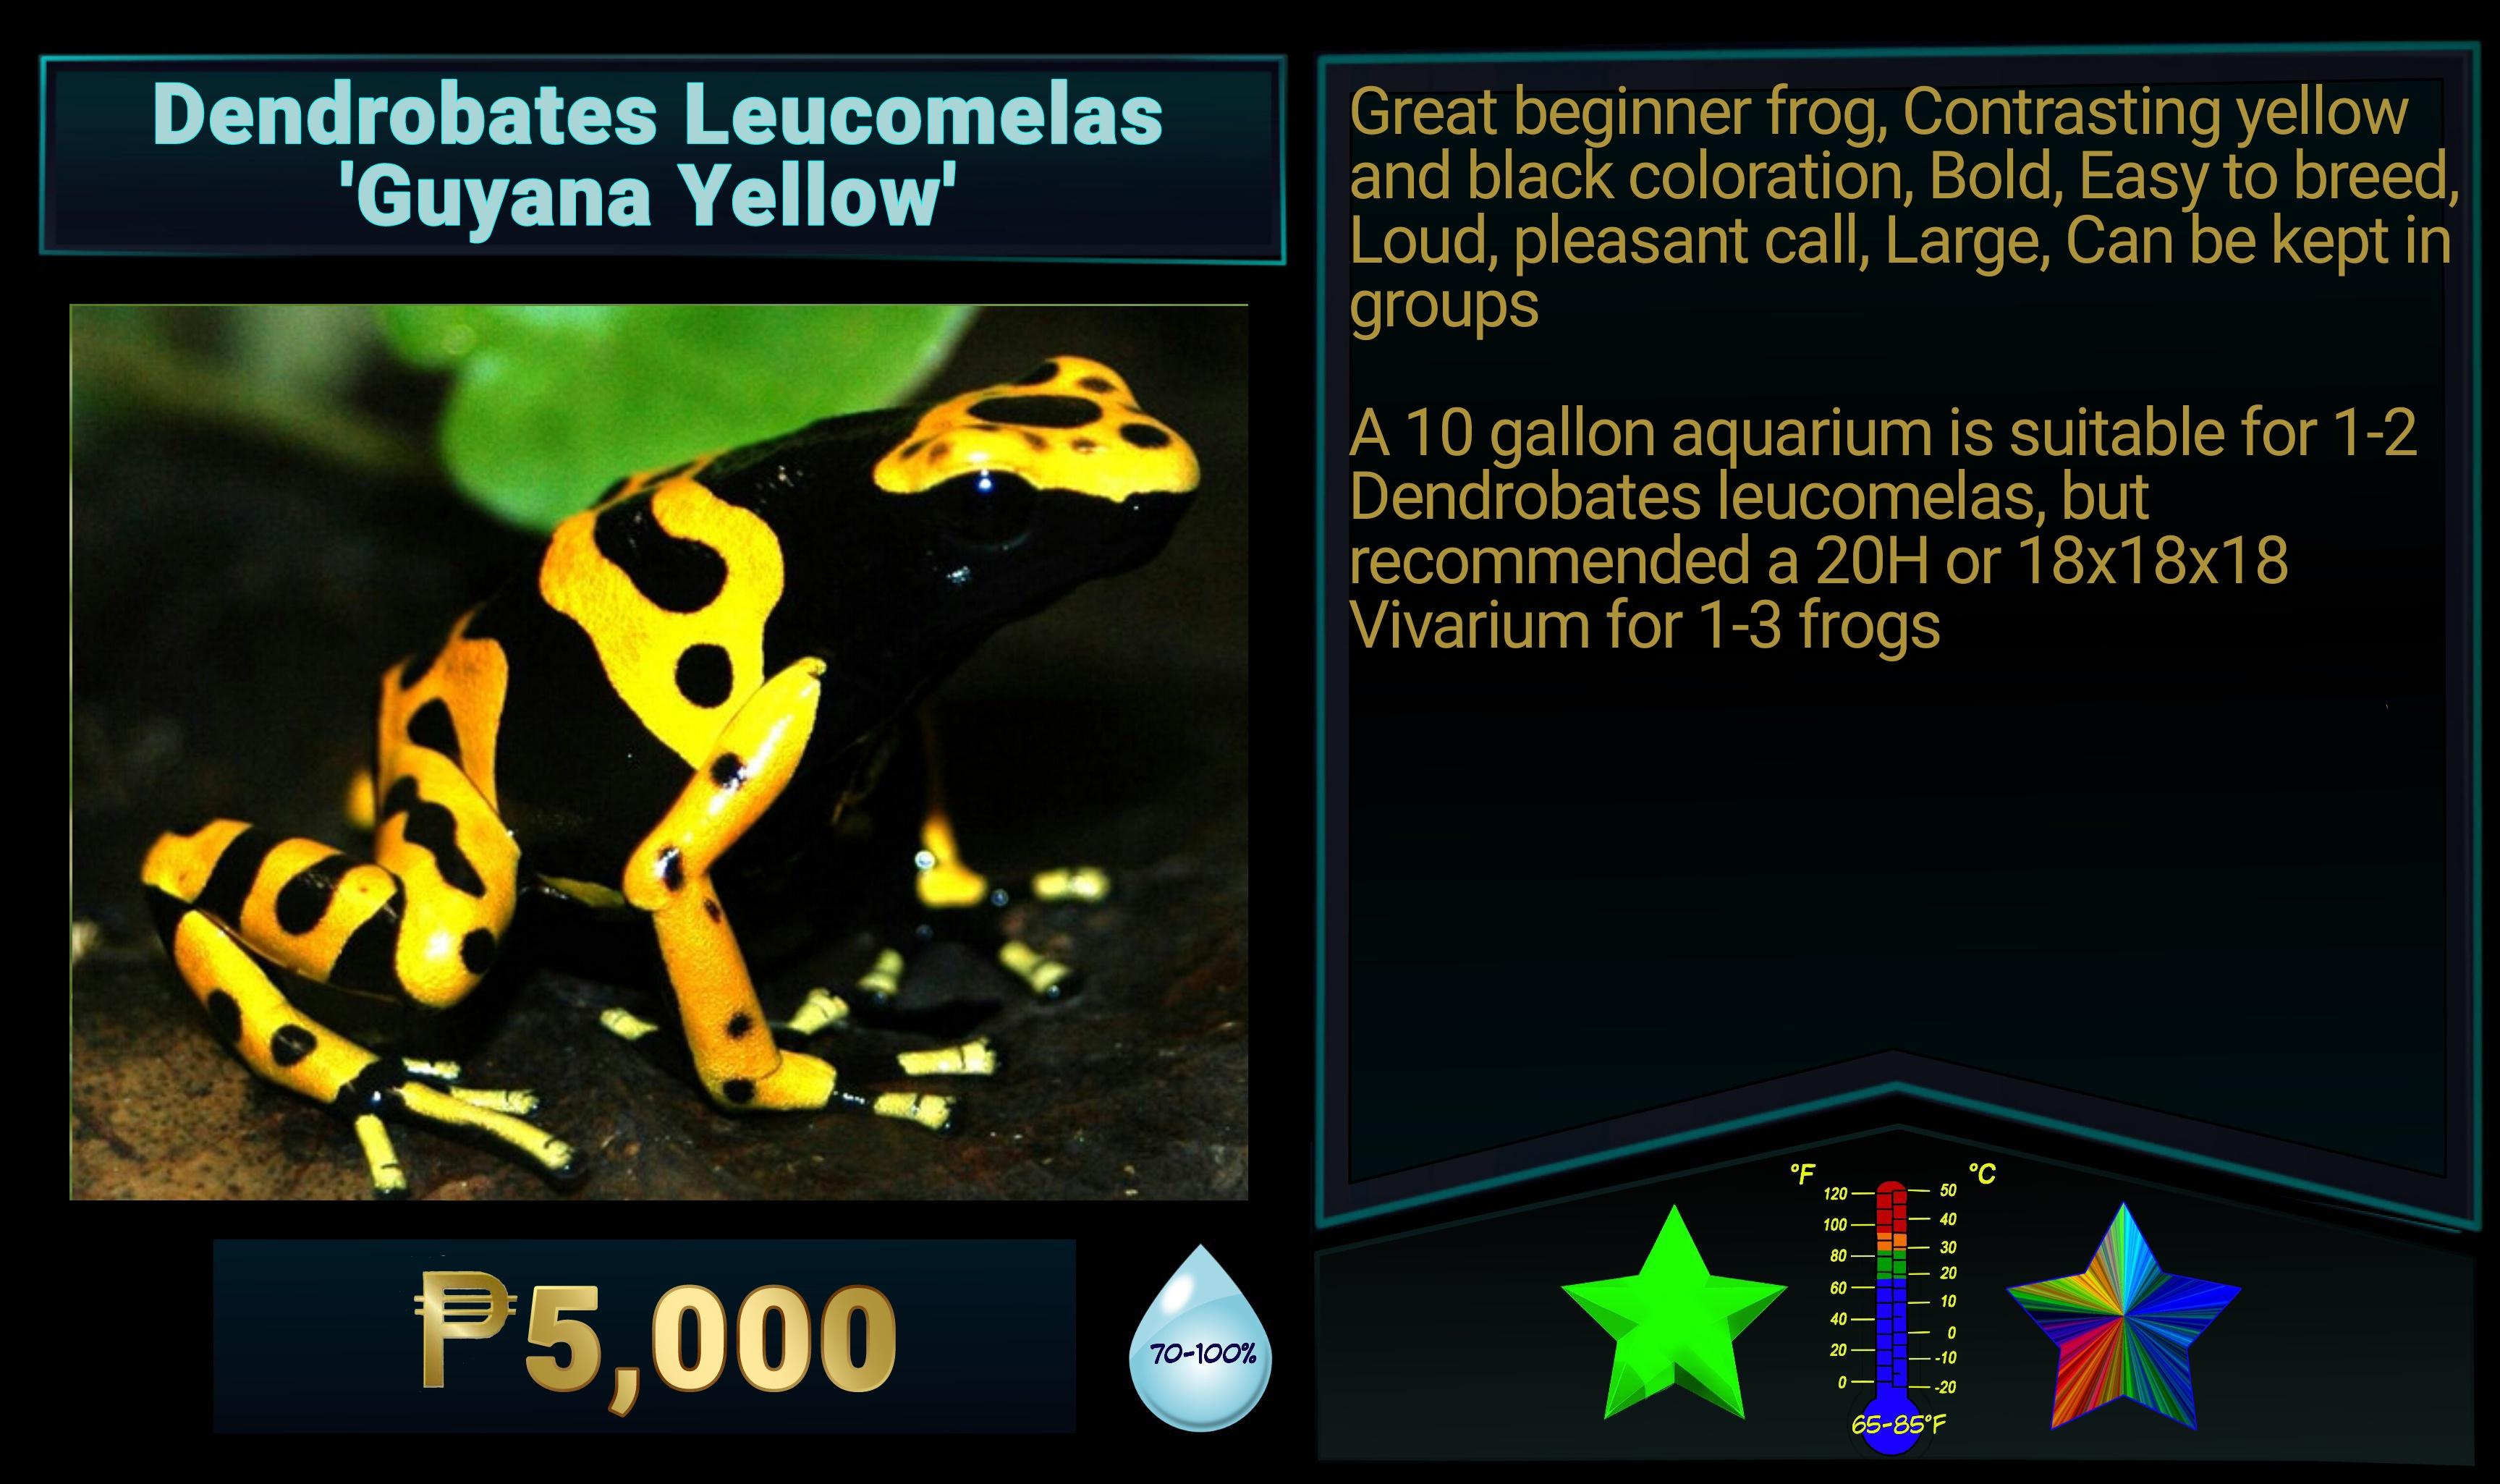 Dendrobates LeucomelasGuyana Yellow